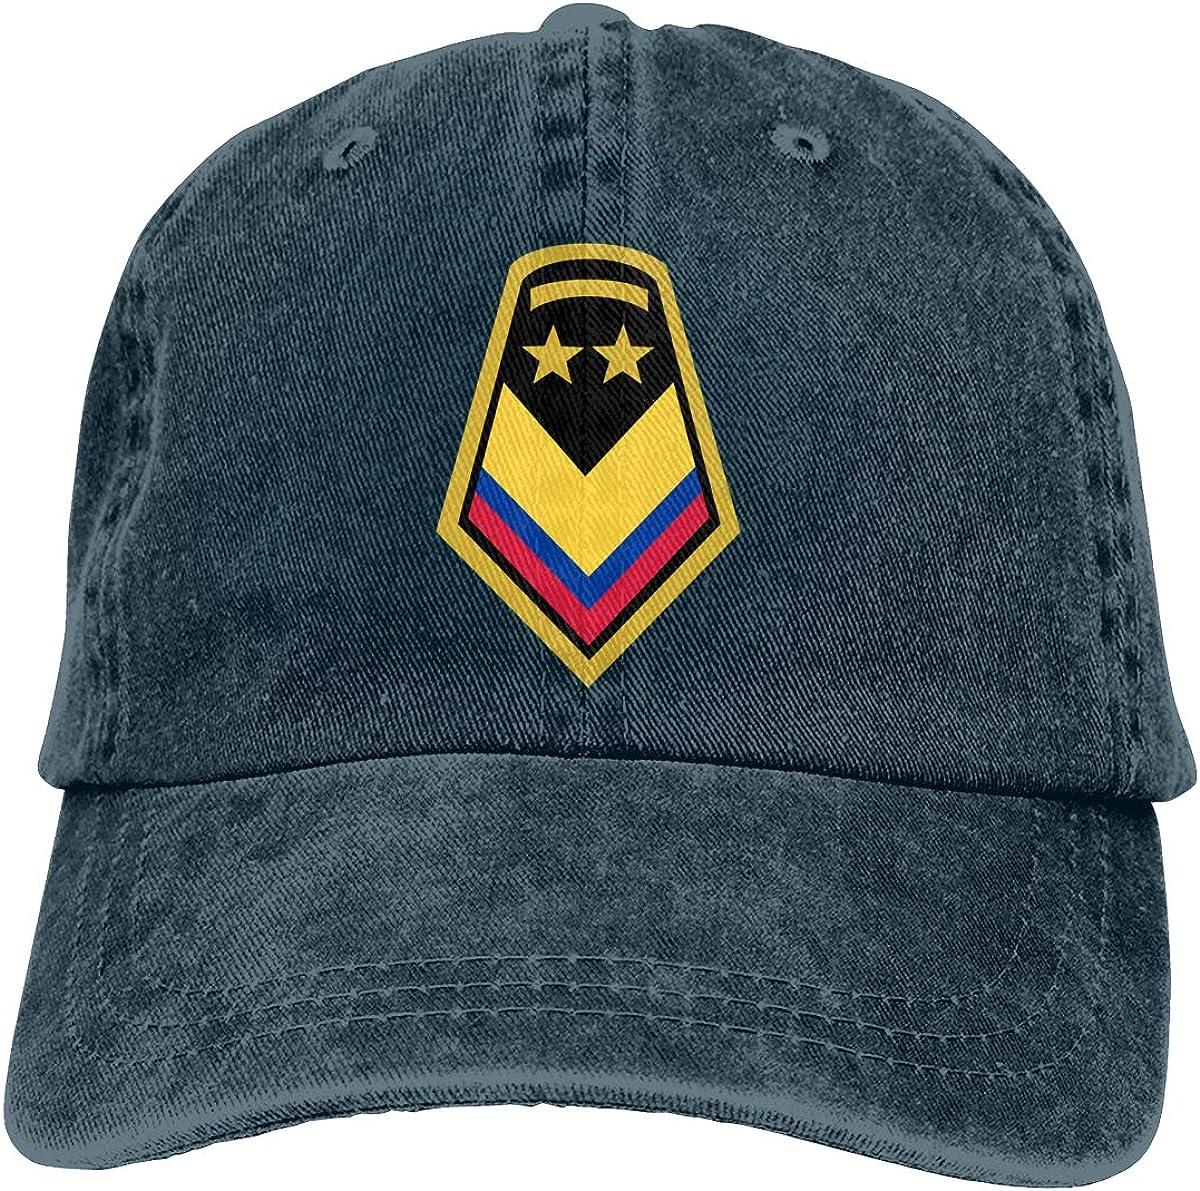 YuHuauhuh Army-Sergeant Cool Cowboy Hat Black